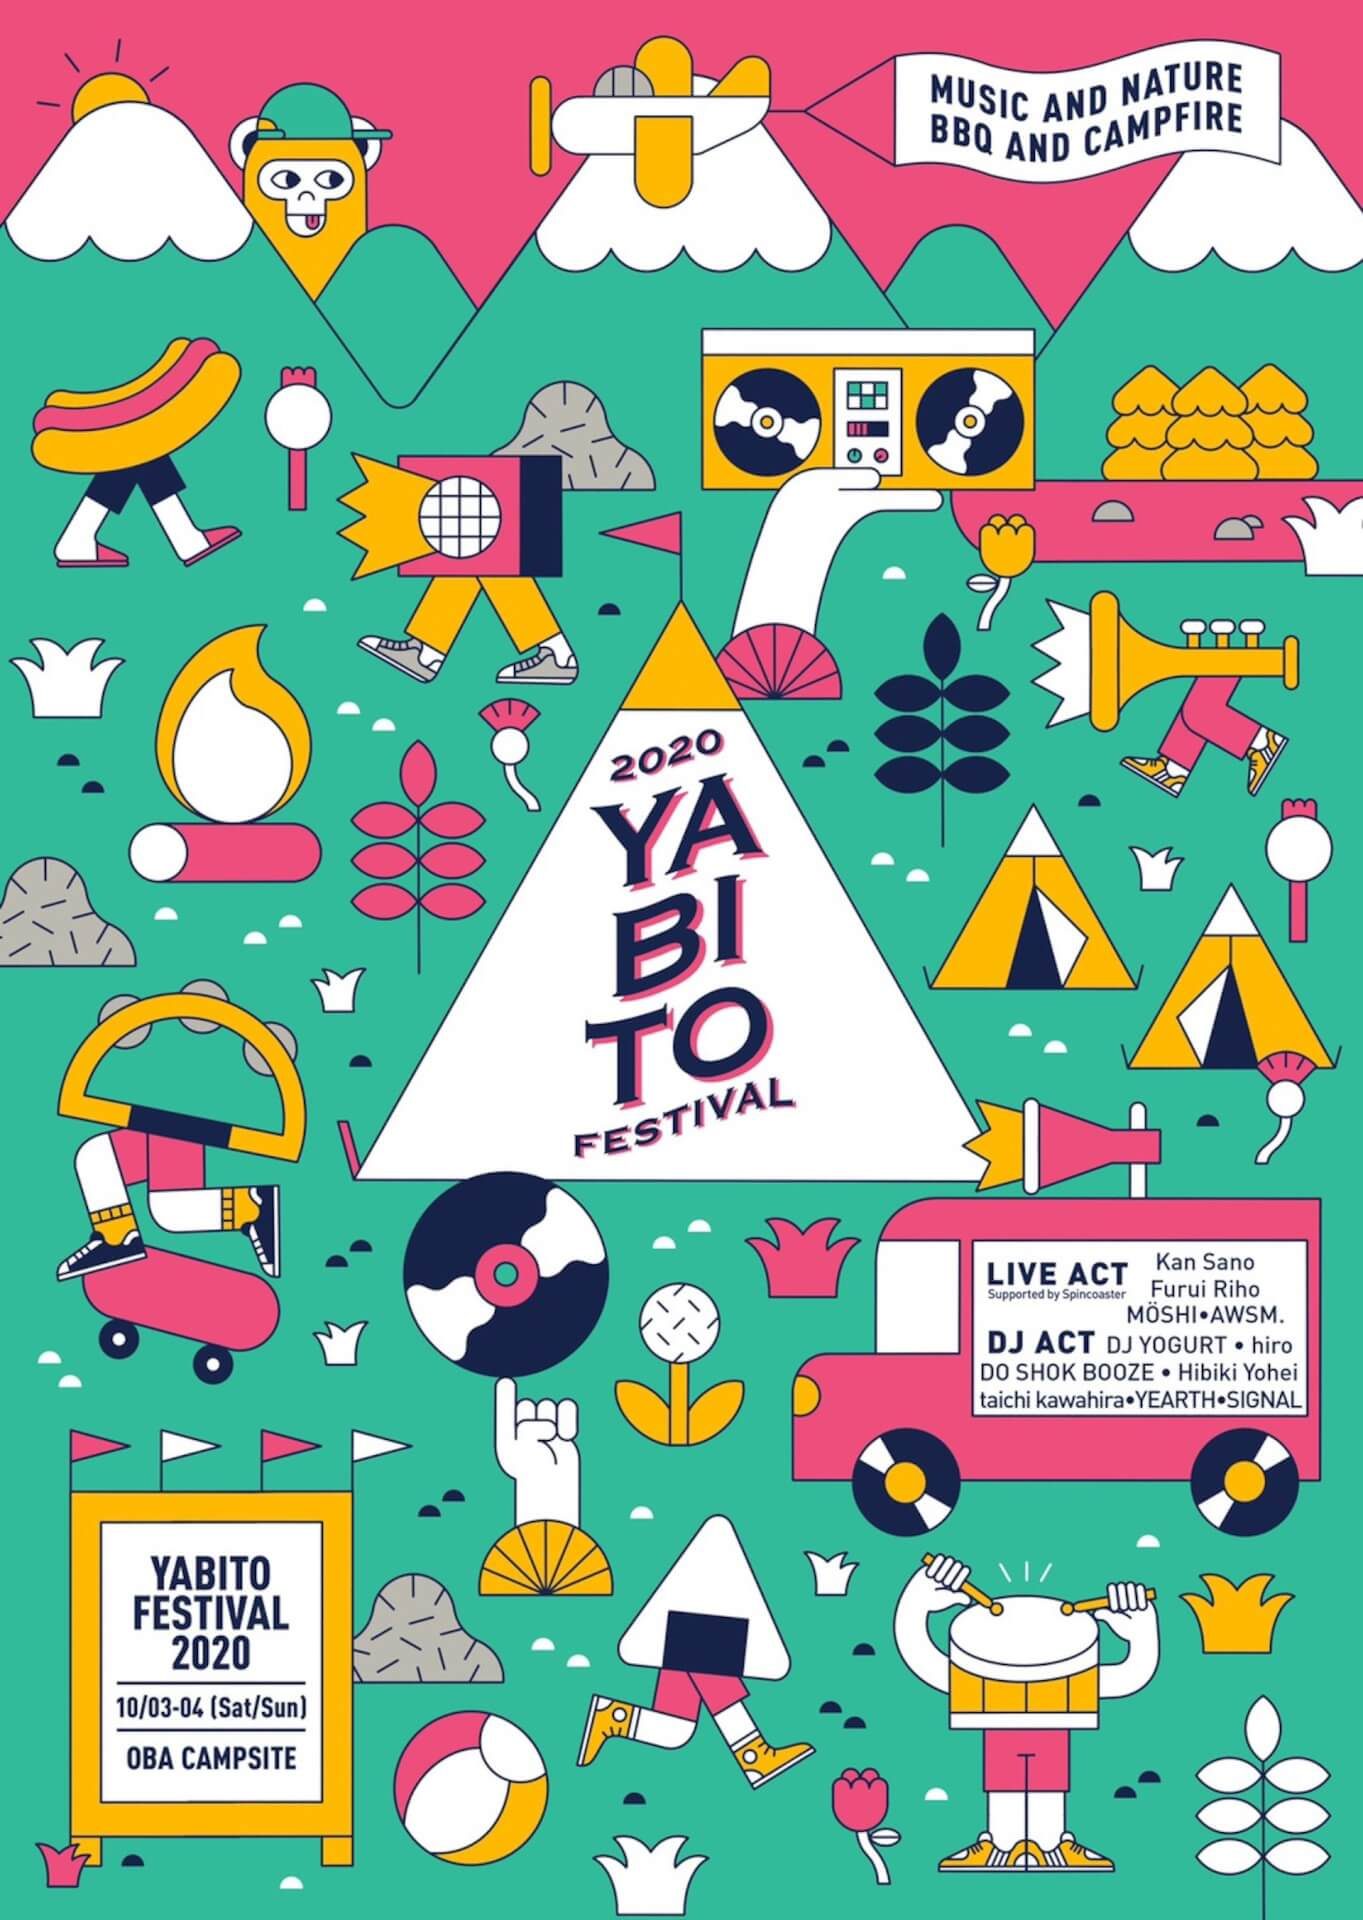 <YABITO FESTIVAL 2020>がおおばキャンプ村で開催決定!第1弾出演アーティストにKan Sano、MÖSHIら4組 music200831_yabito_4